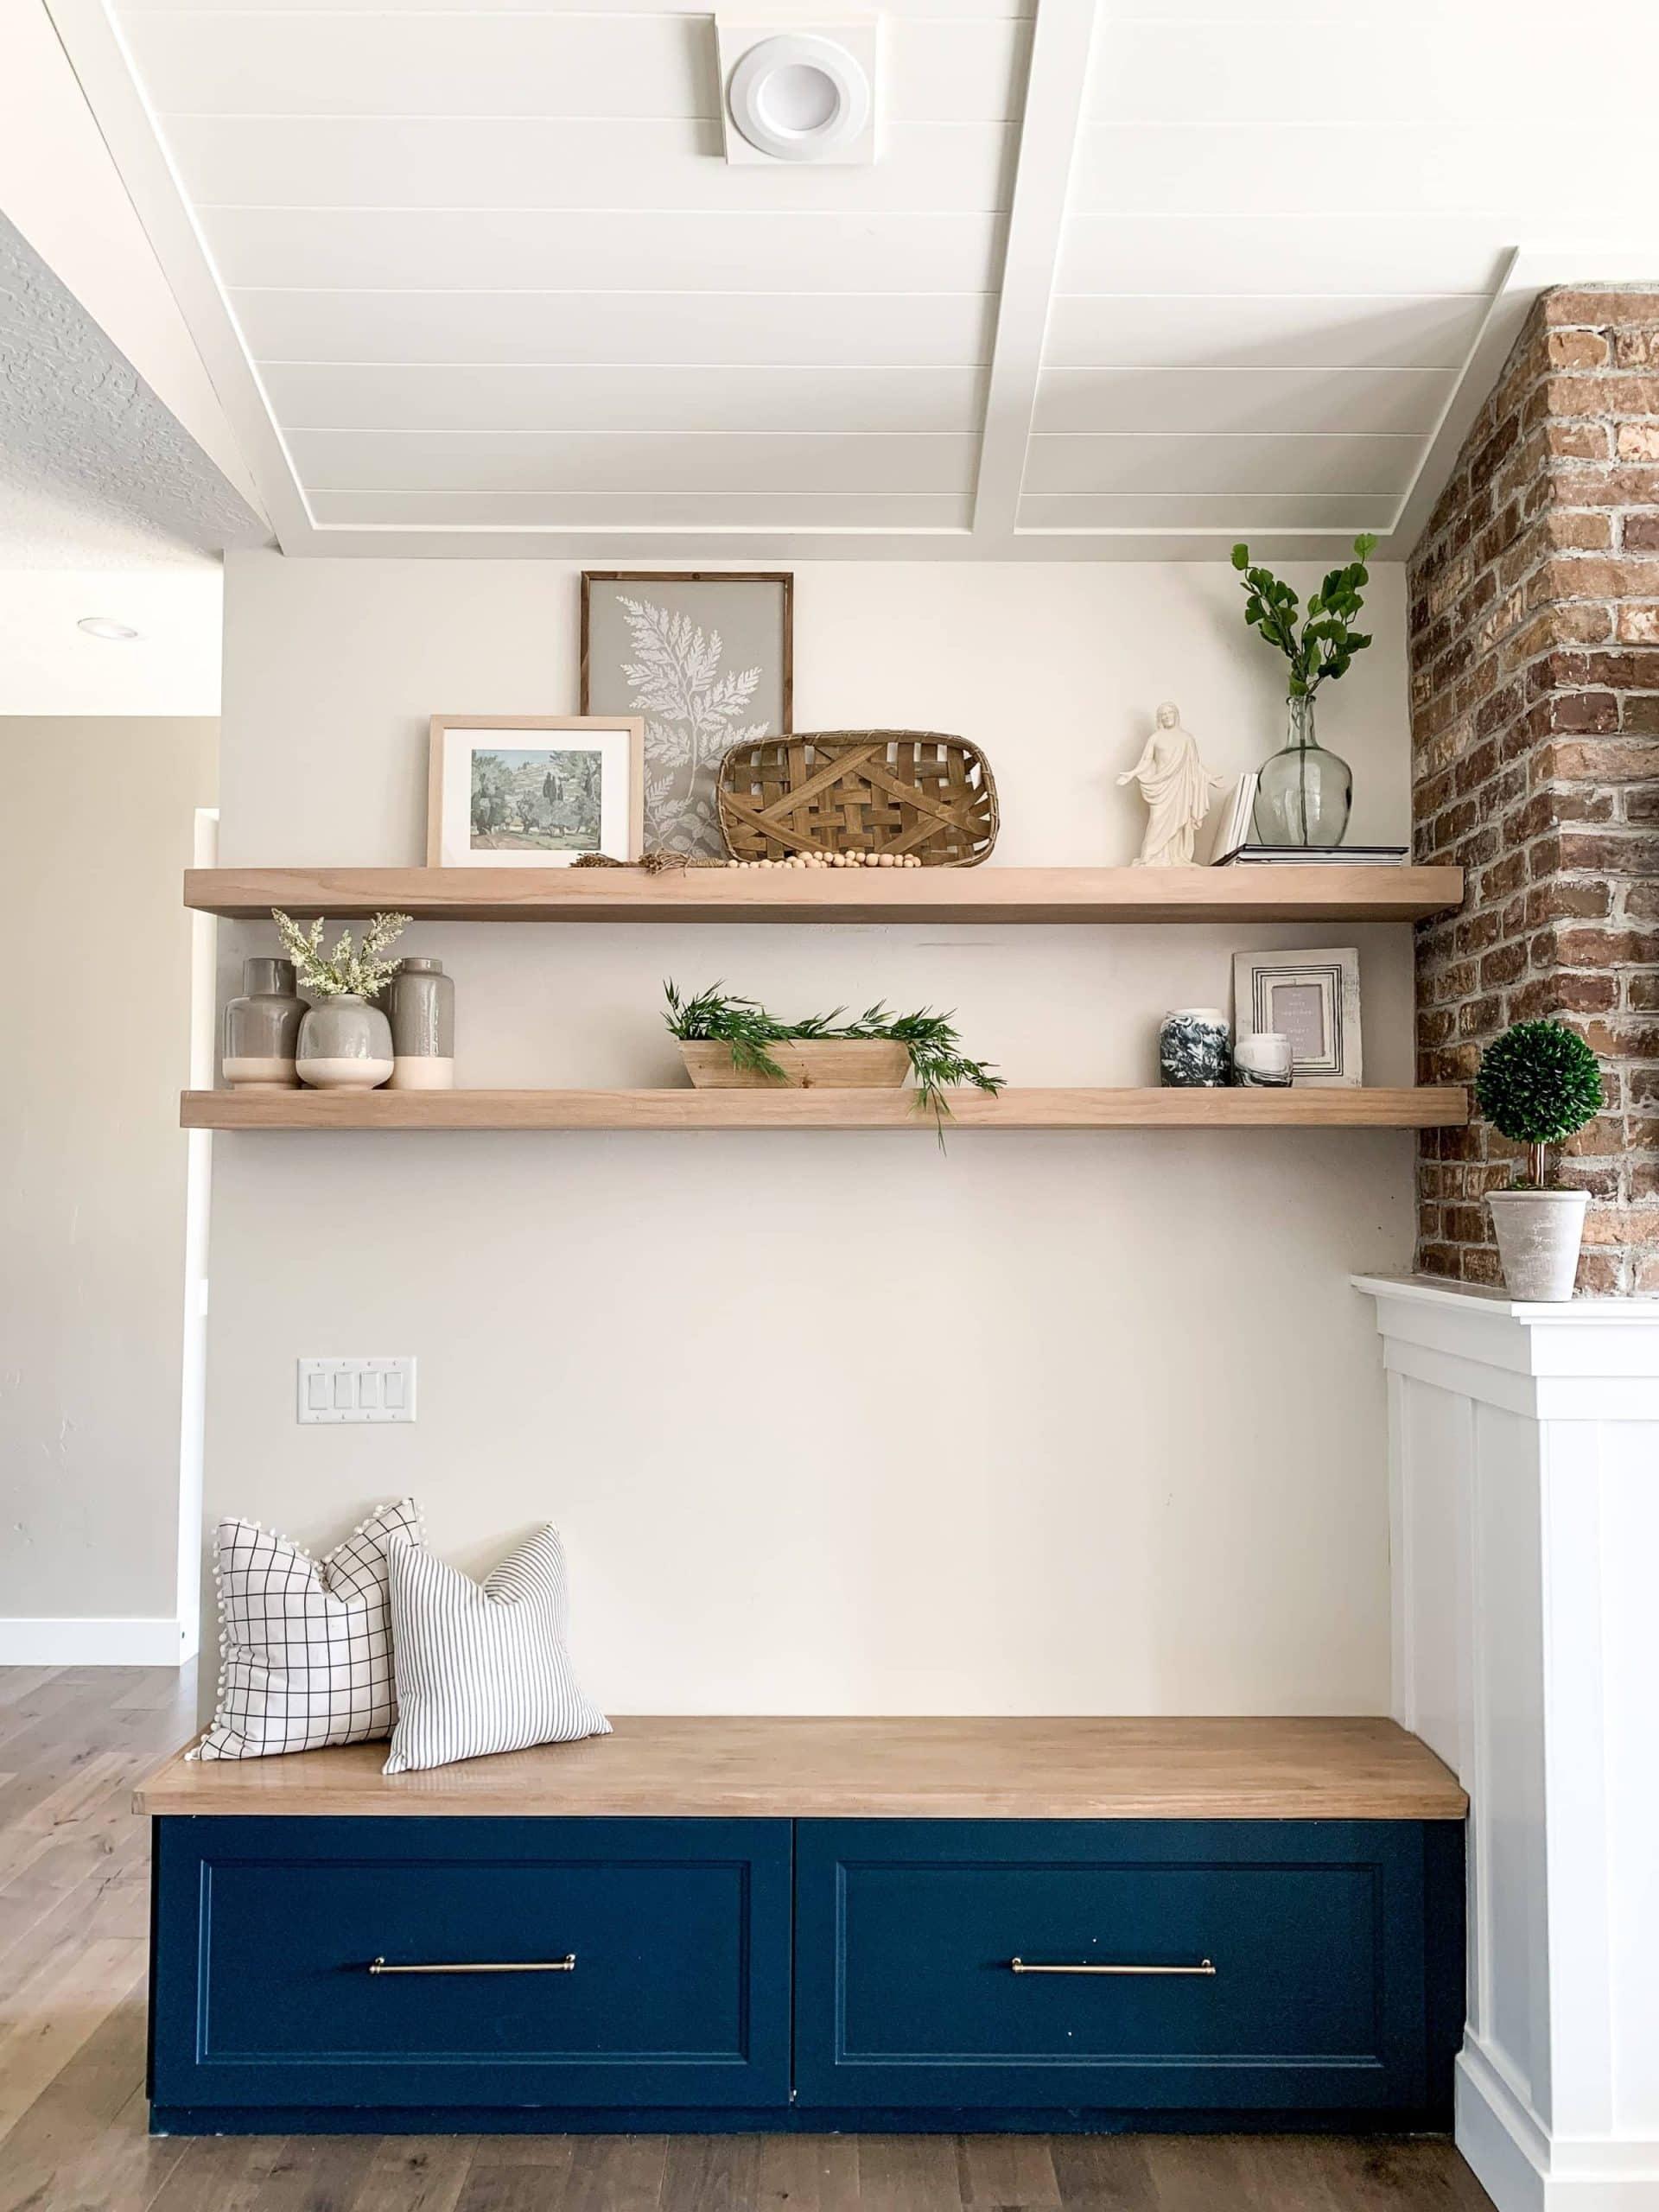 How to build oak shelves